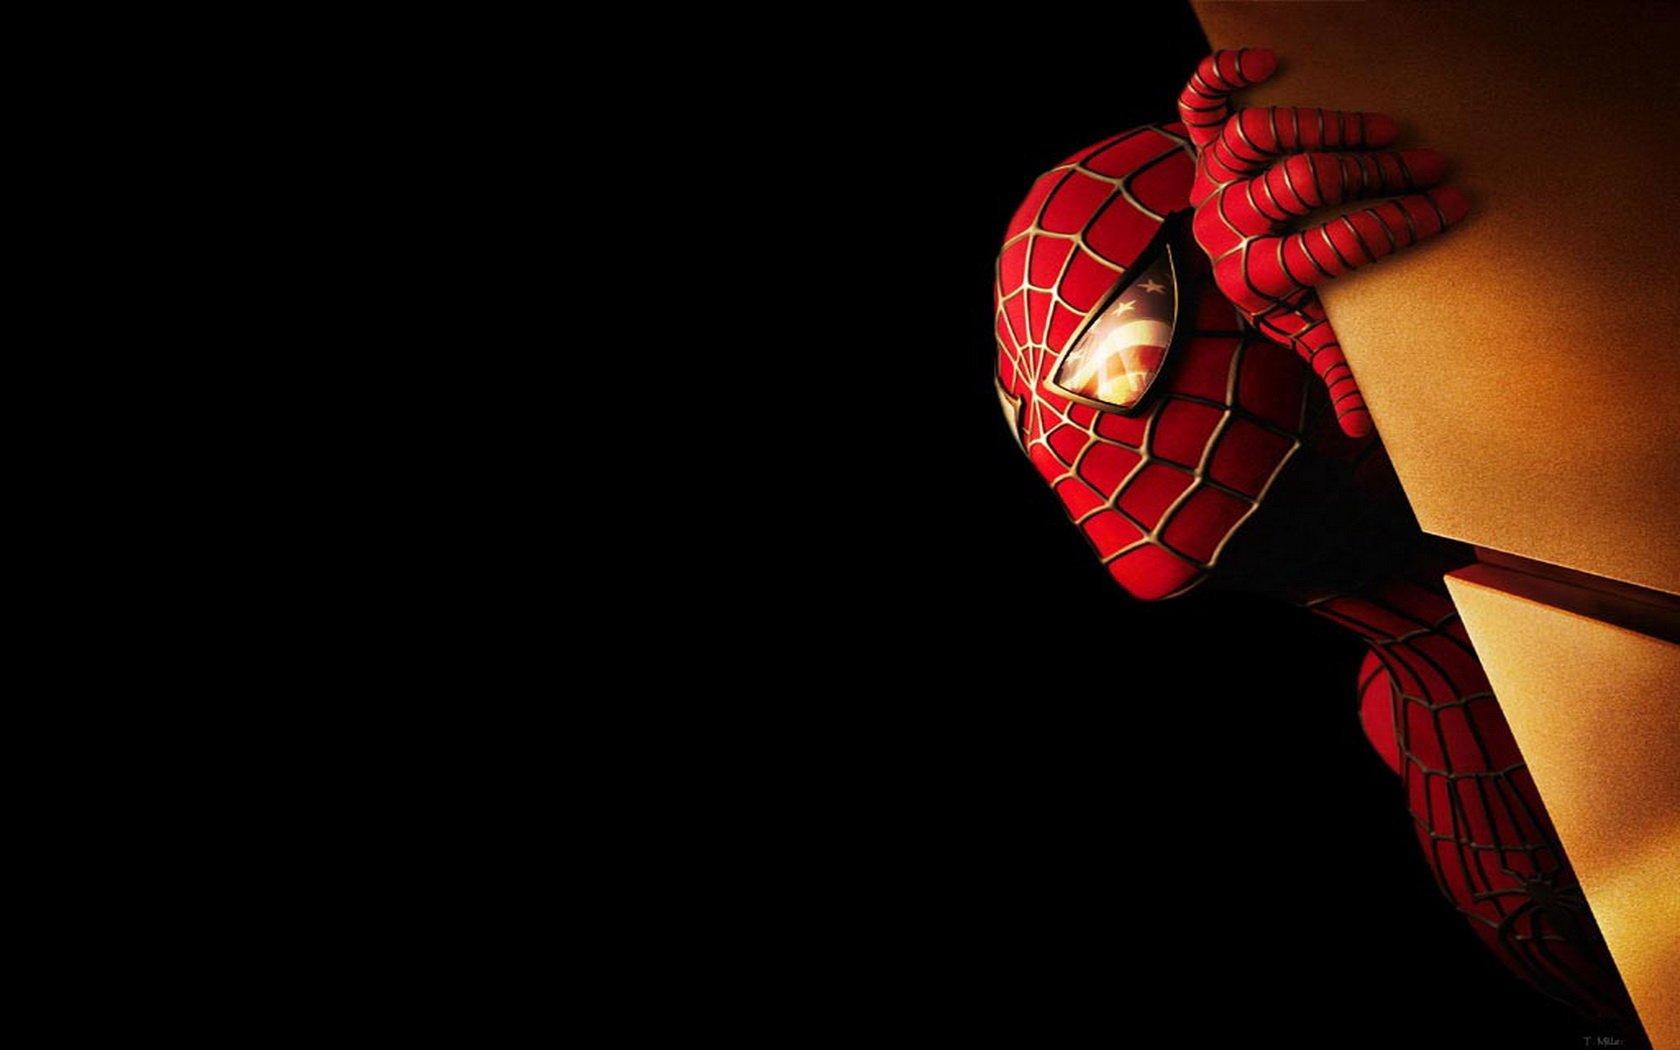 Spider-Man Fond d'écran and Arrière-Plan | 1680x1050 | ID:396606